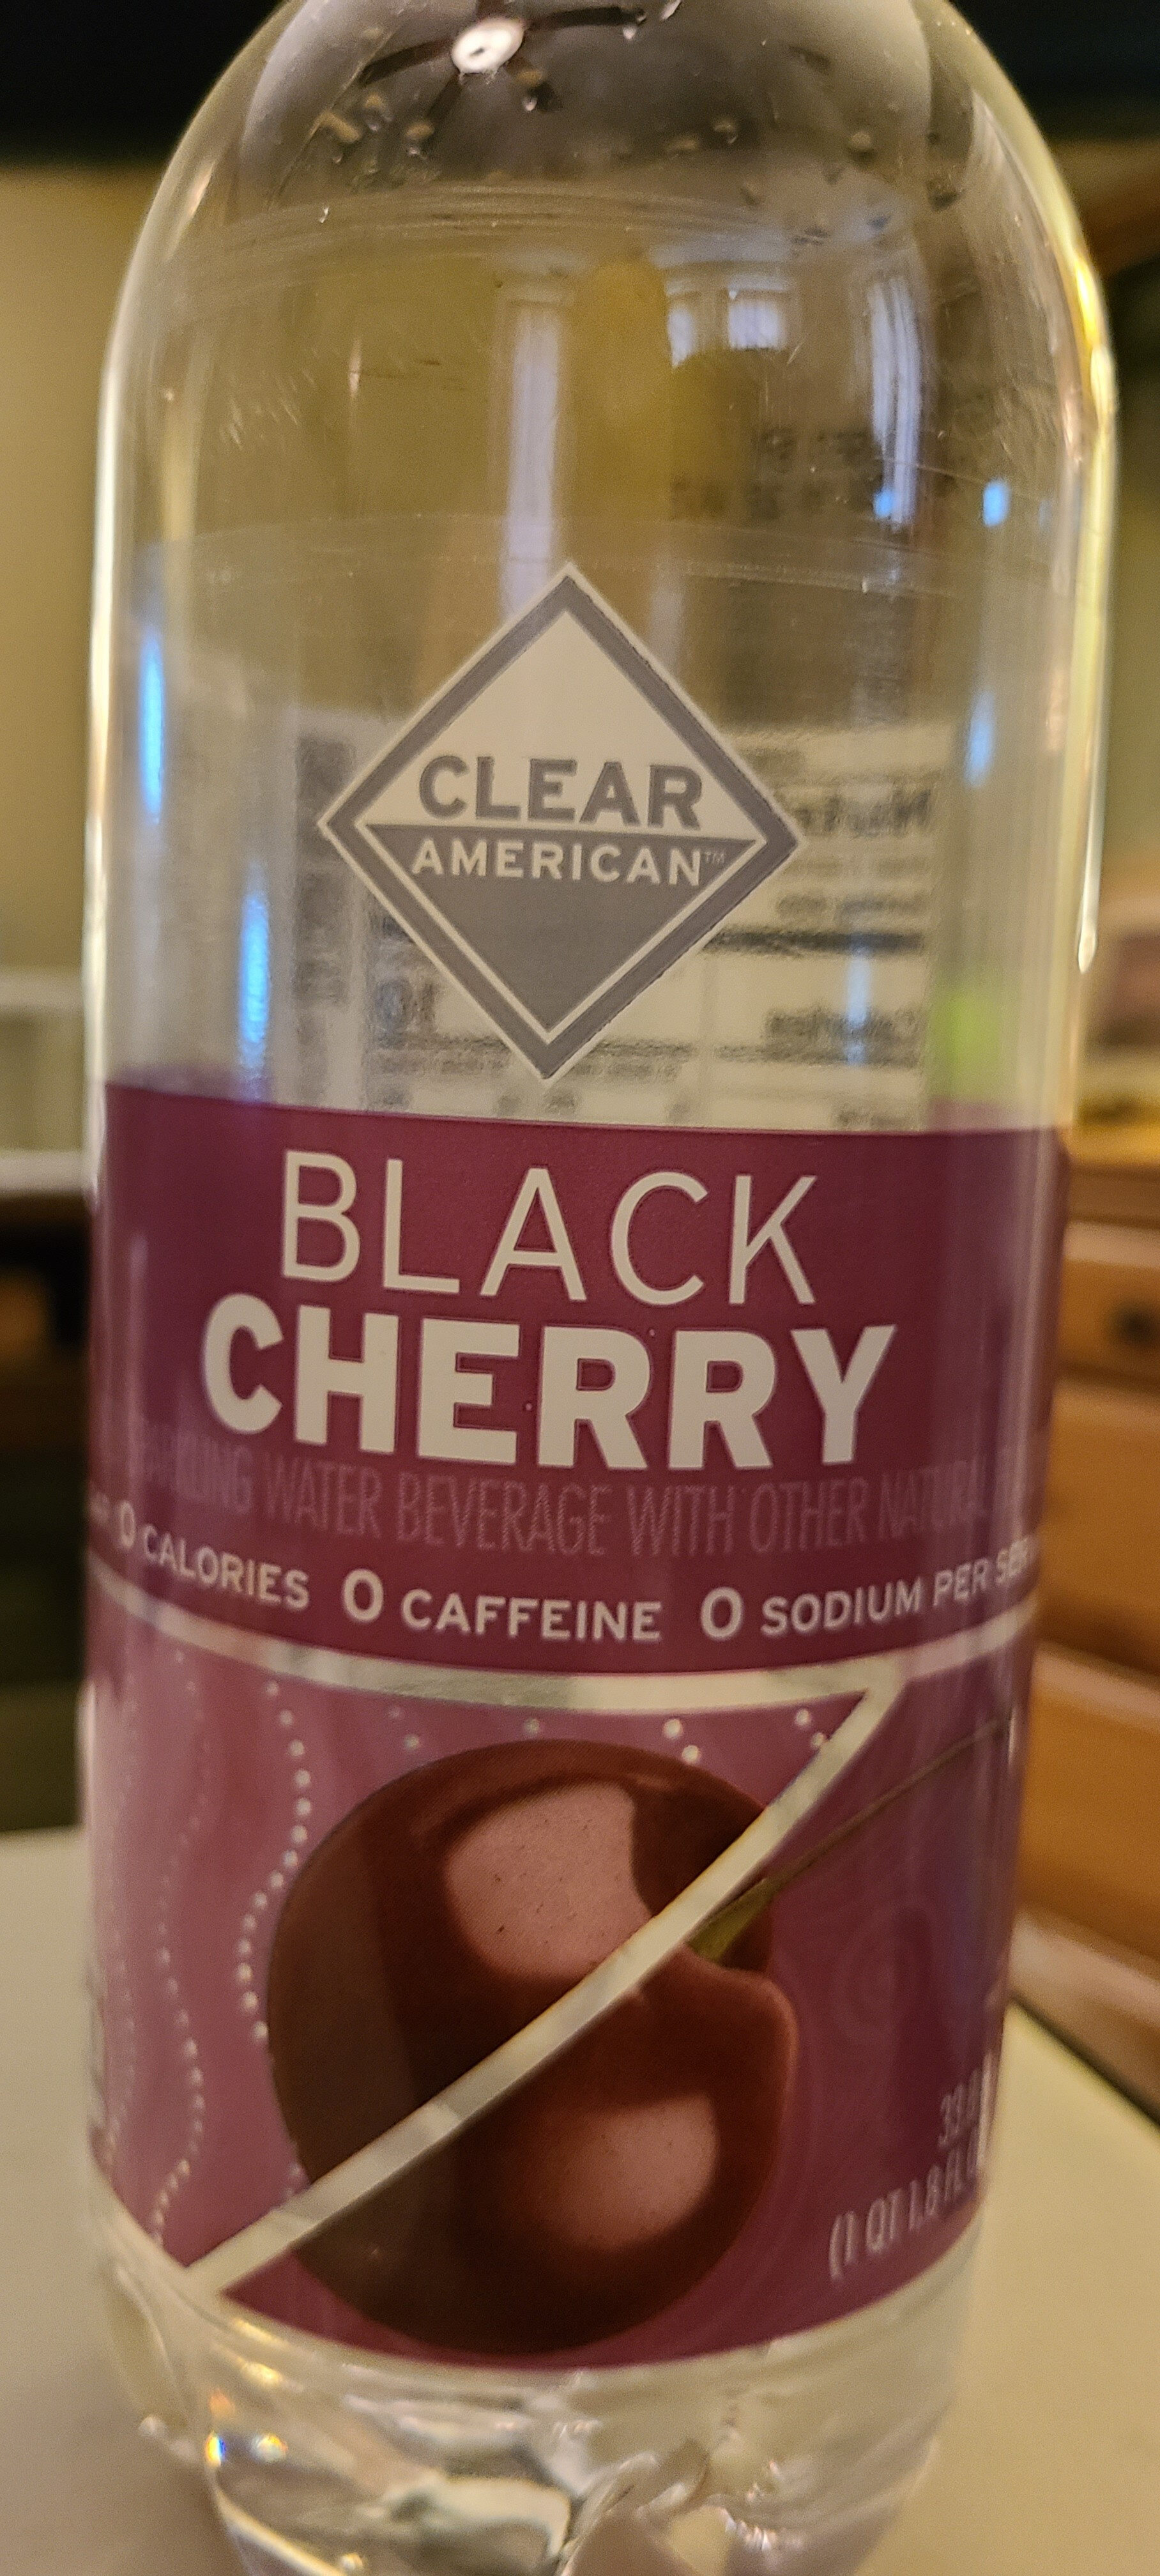 Clear american, sparkling water beverage, black cherry - Prodotto - en